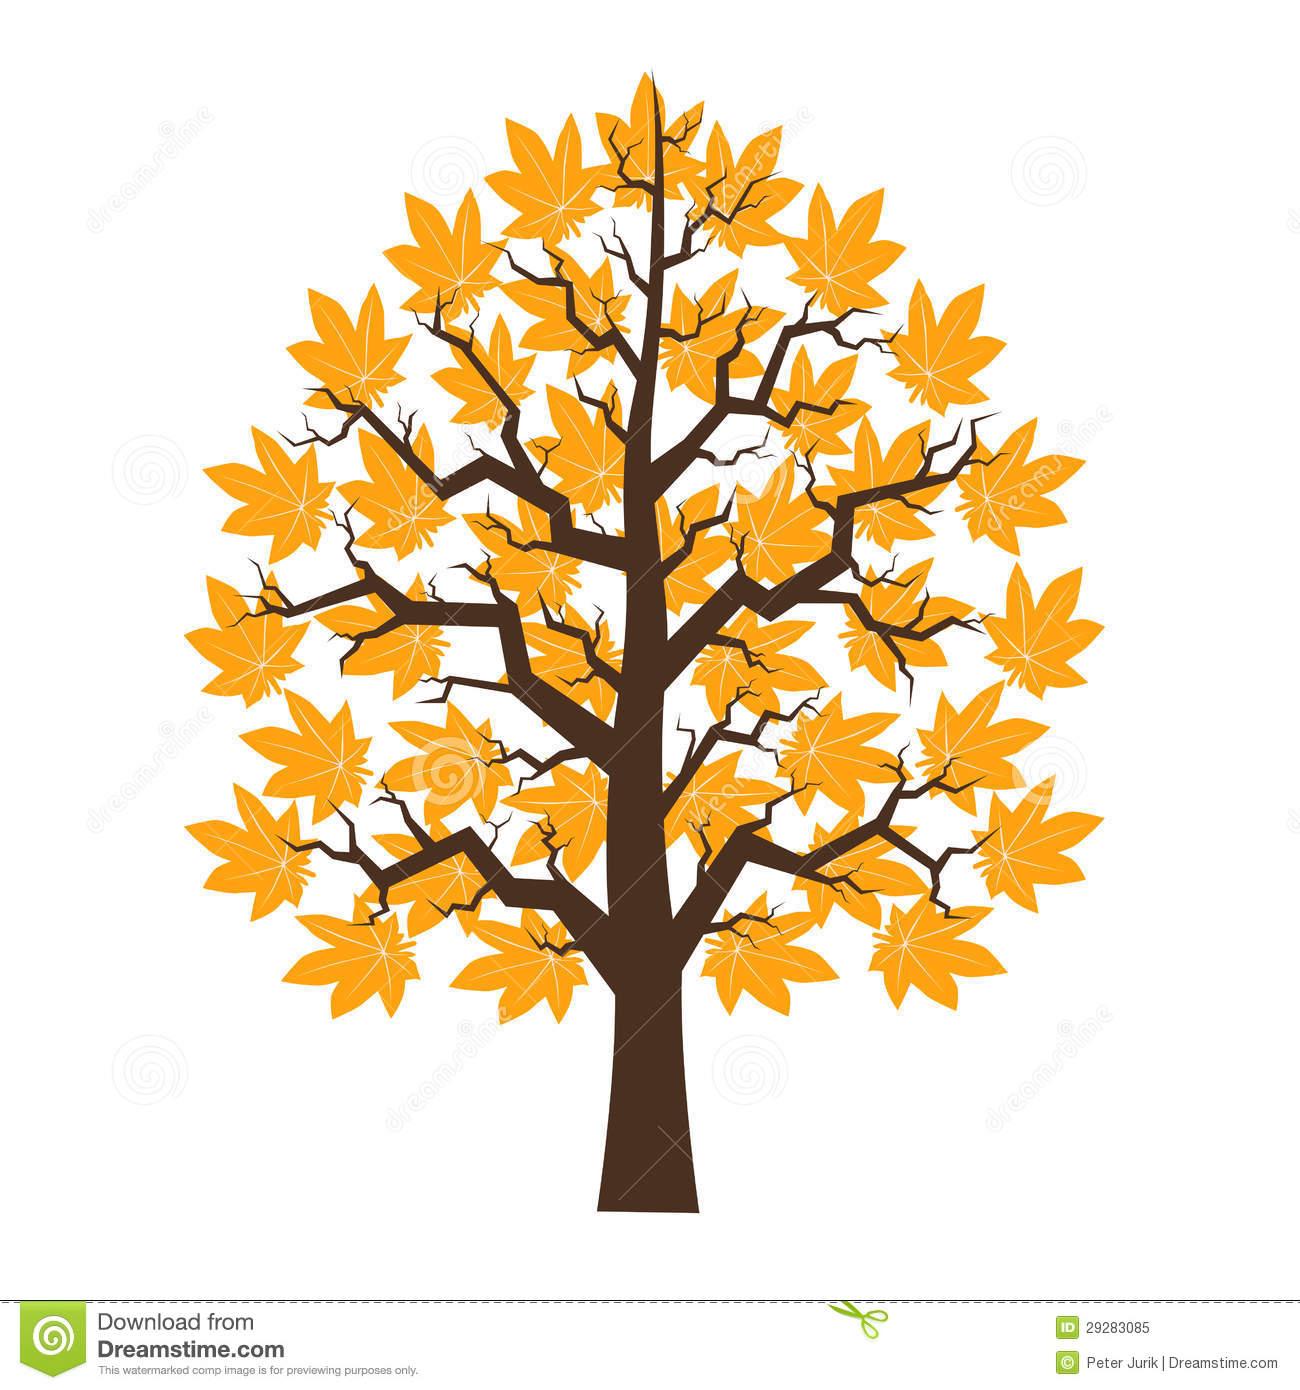 Cartoon maple tree